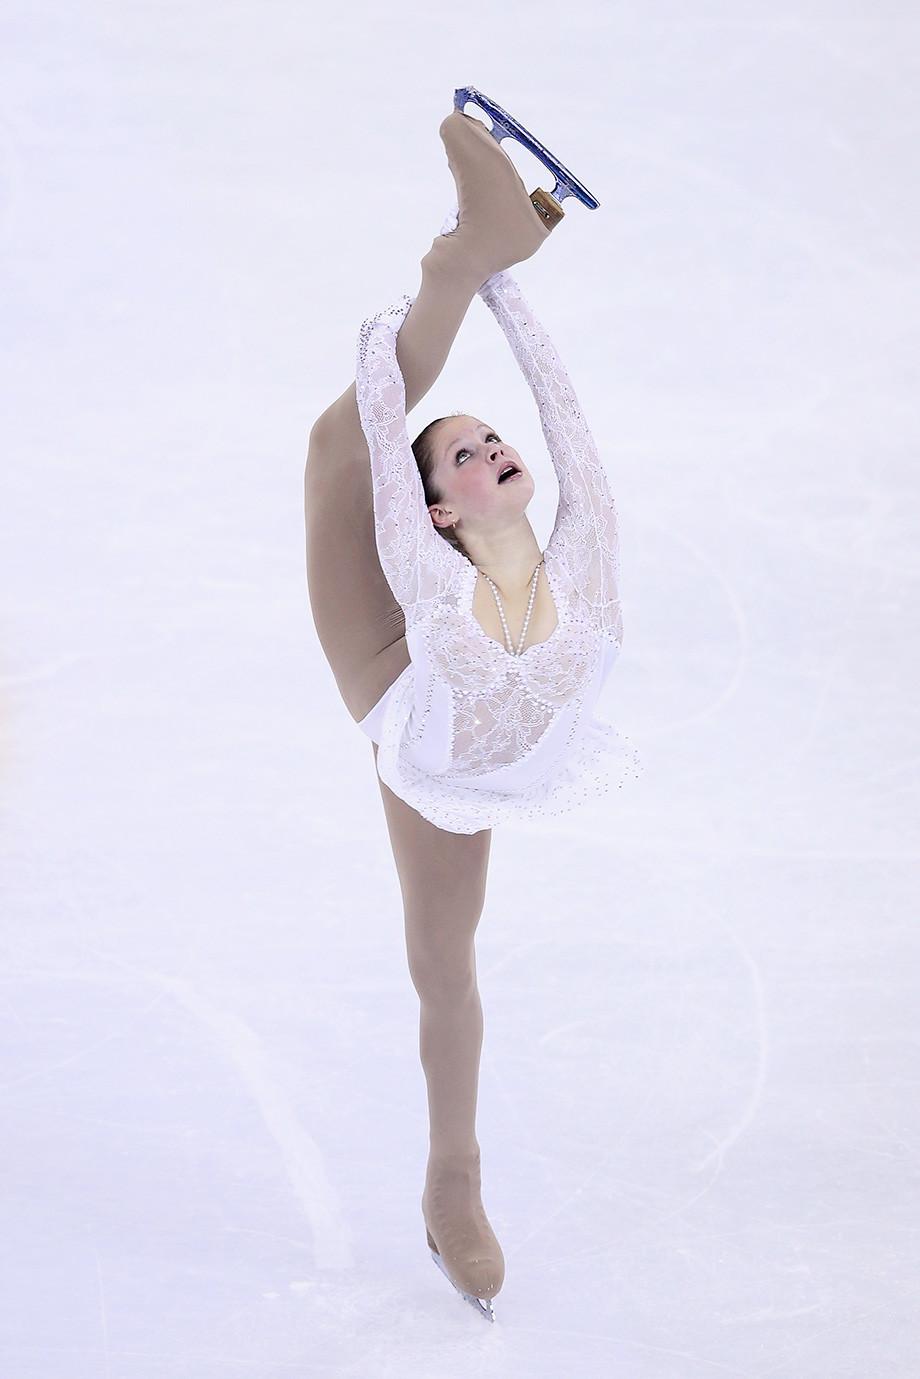 figuristka-lipnitskaya-ero-foto